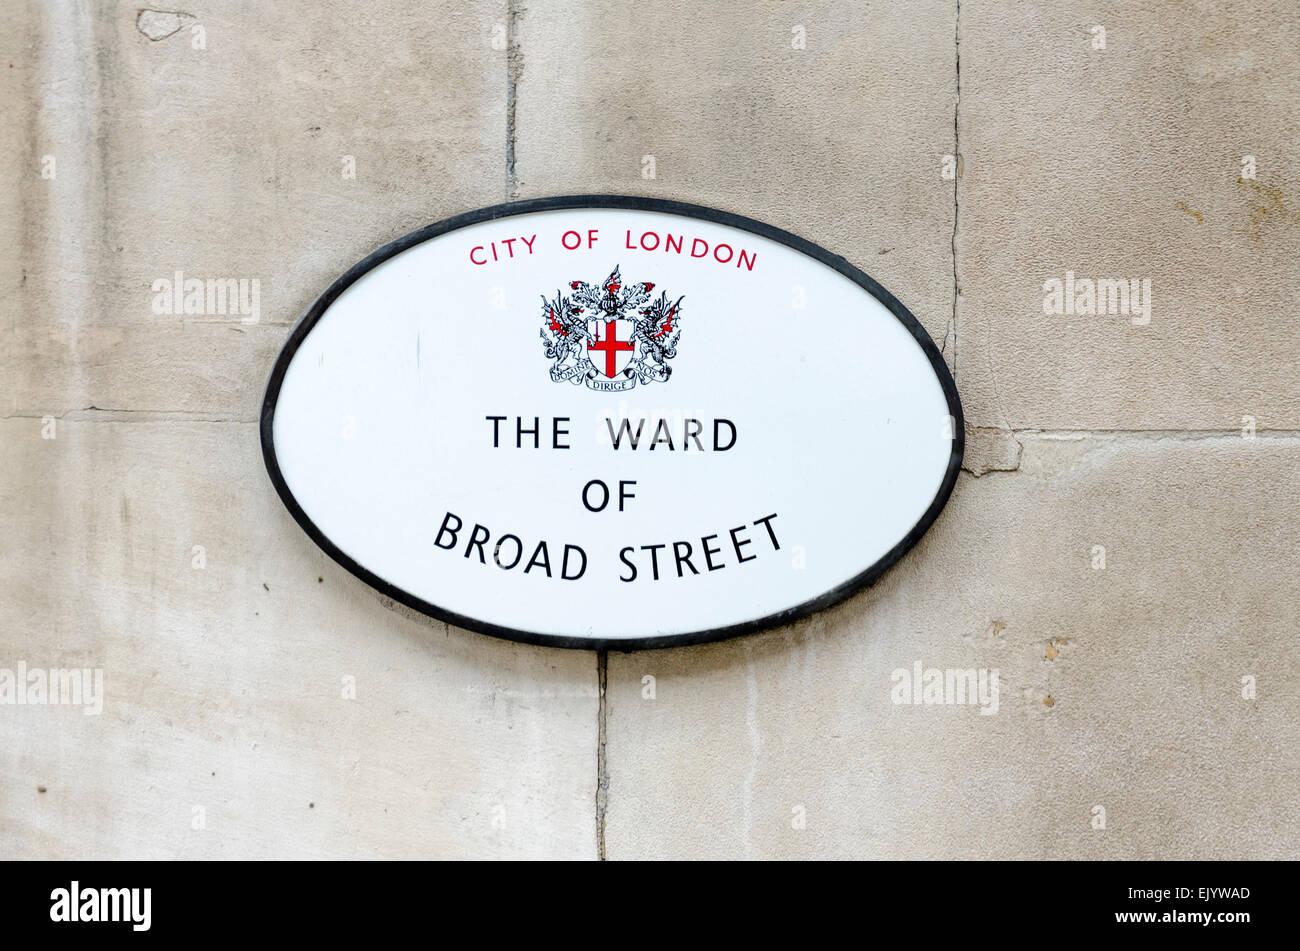 The Ward of Broad Street sign, London, UK - Stock Image